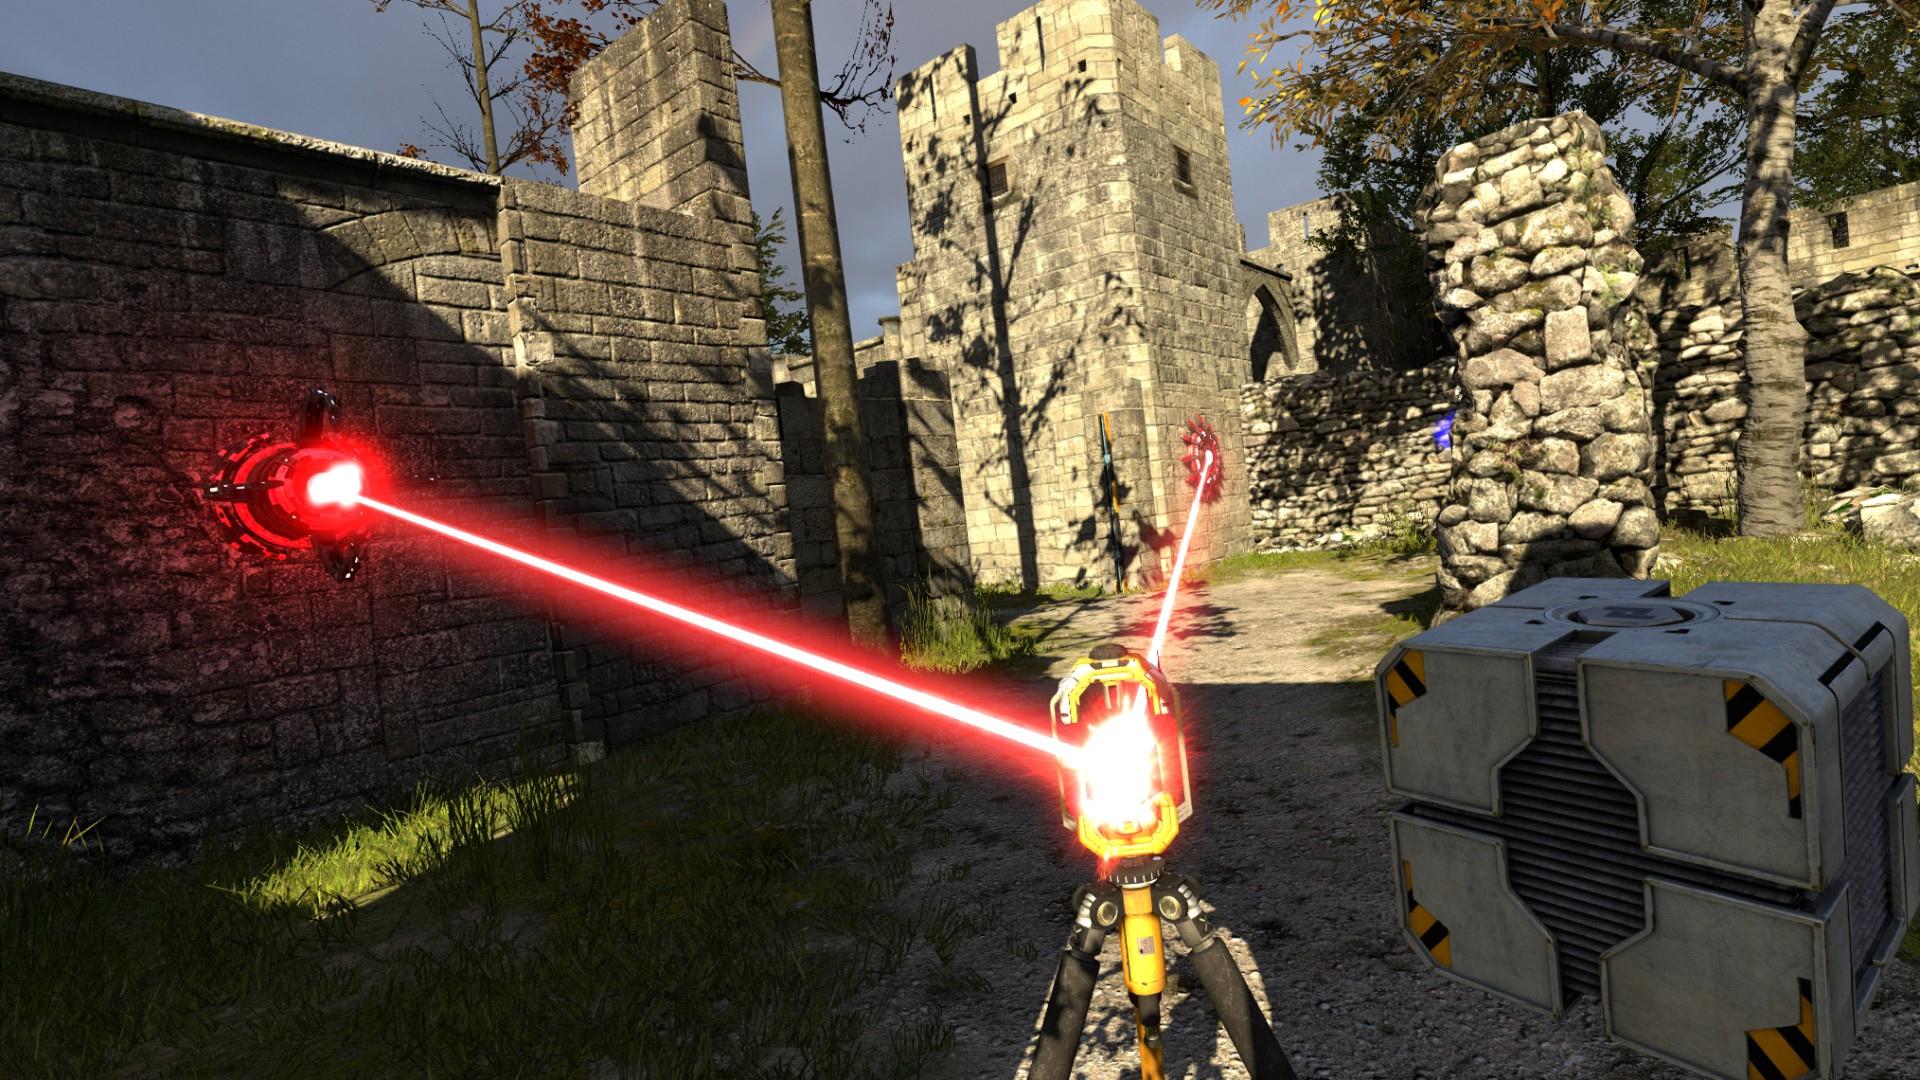 The Talos Principle has come to Oculus Rift and Vive screenshot